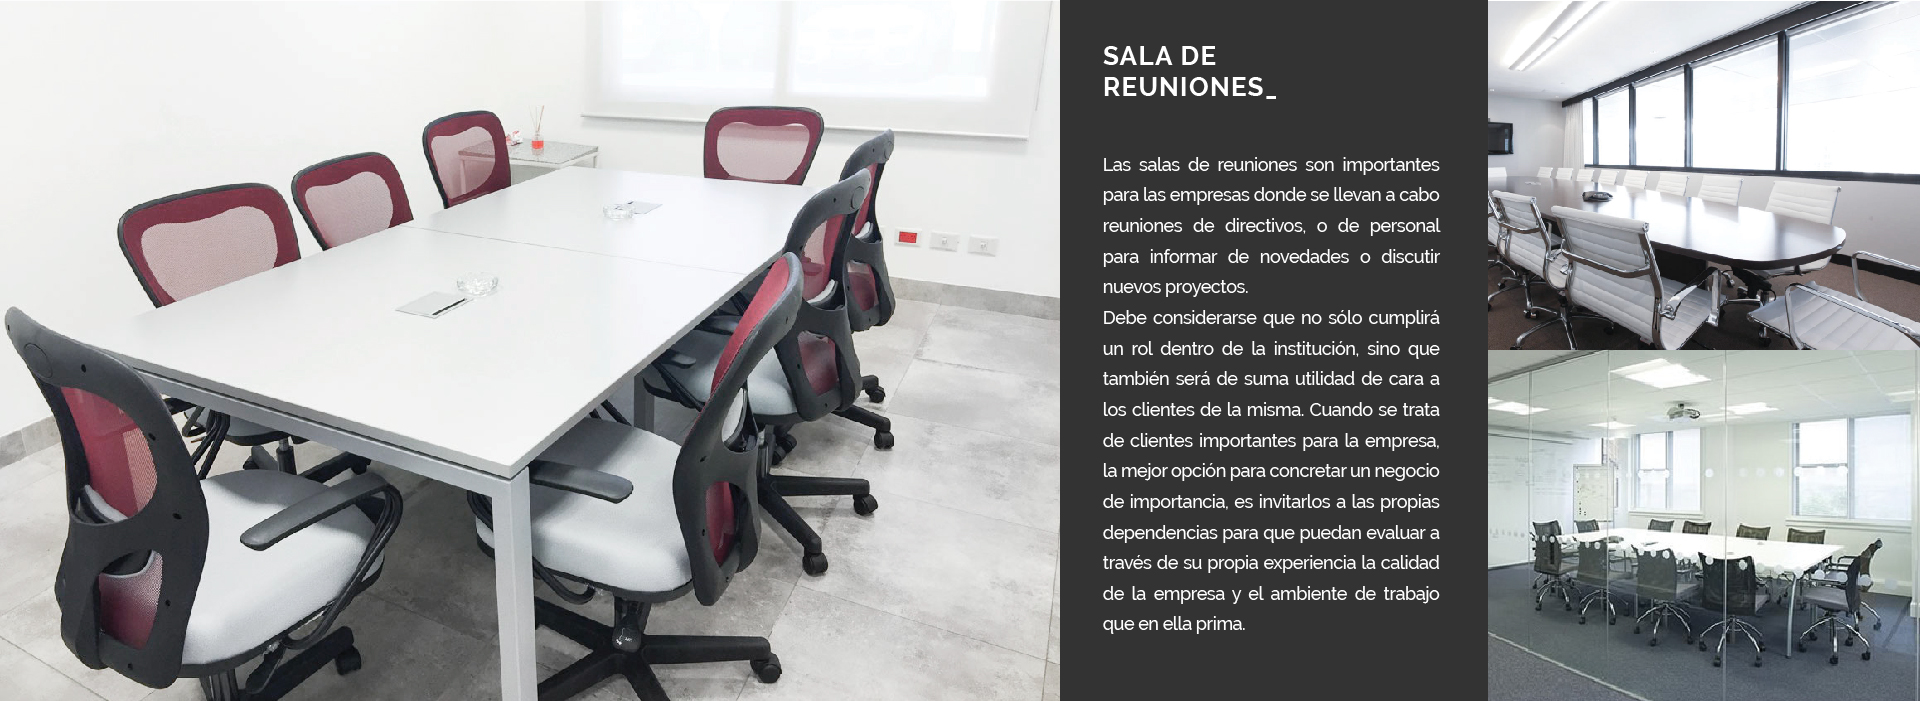 espacios-06